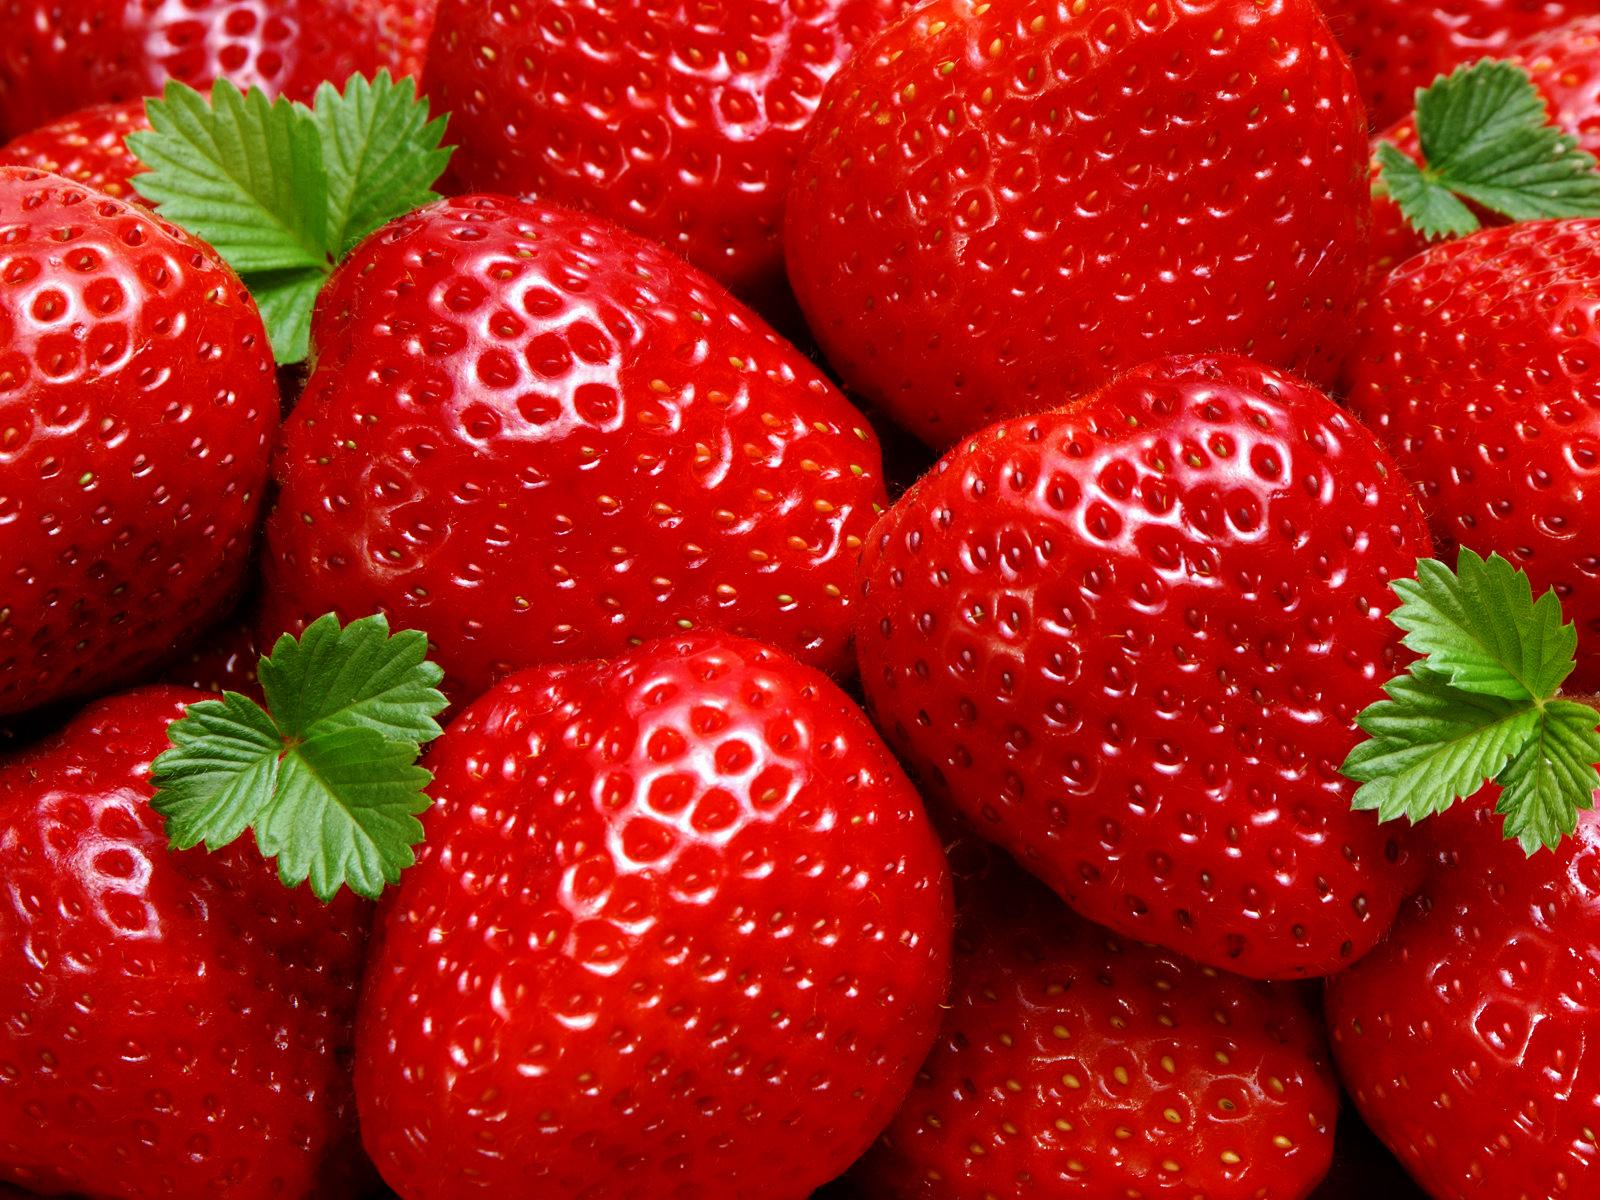 Fresh Strawberries Photography HD Wallpapers Desktop Wallpaper 1600x1200